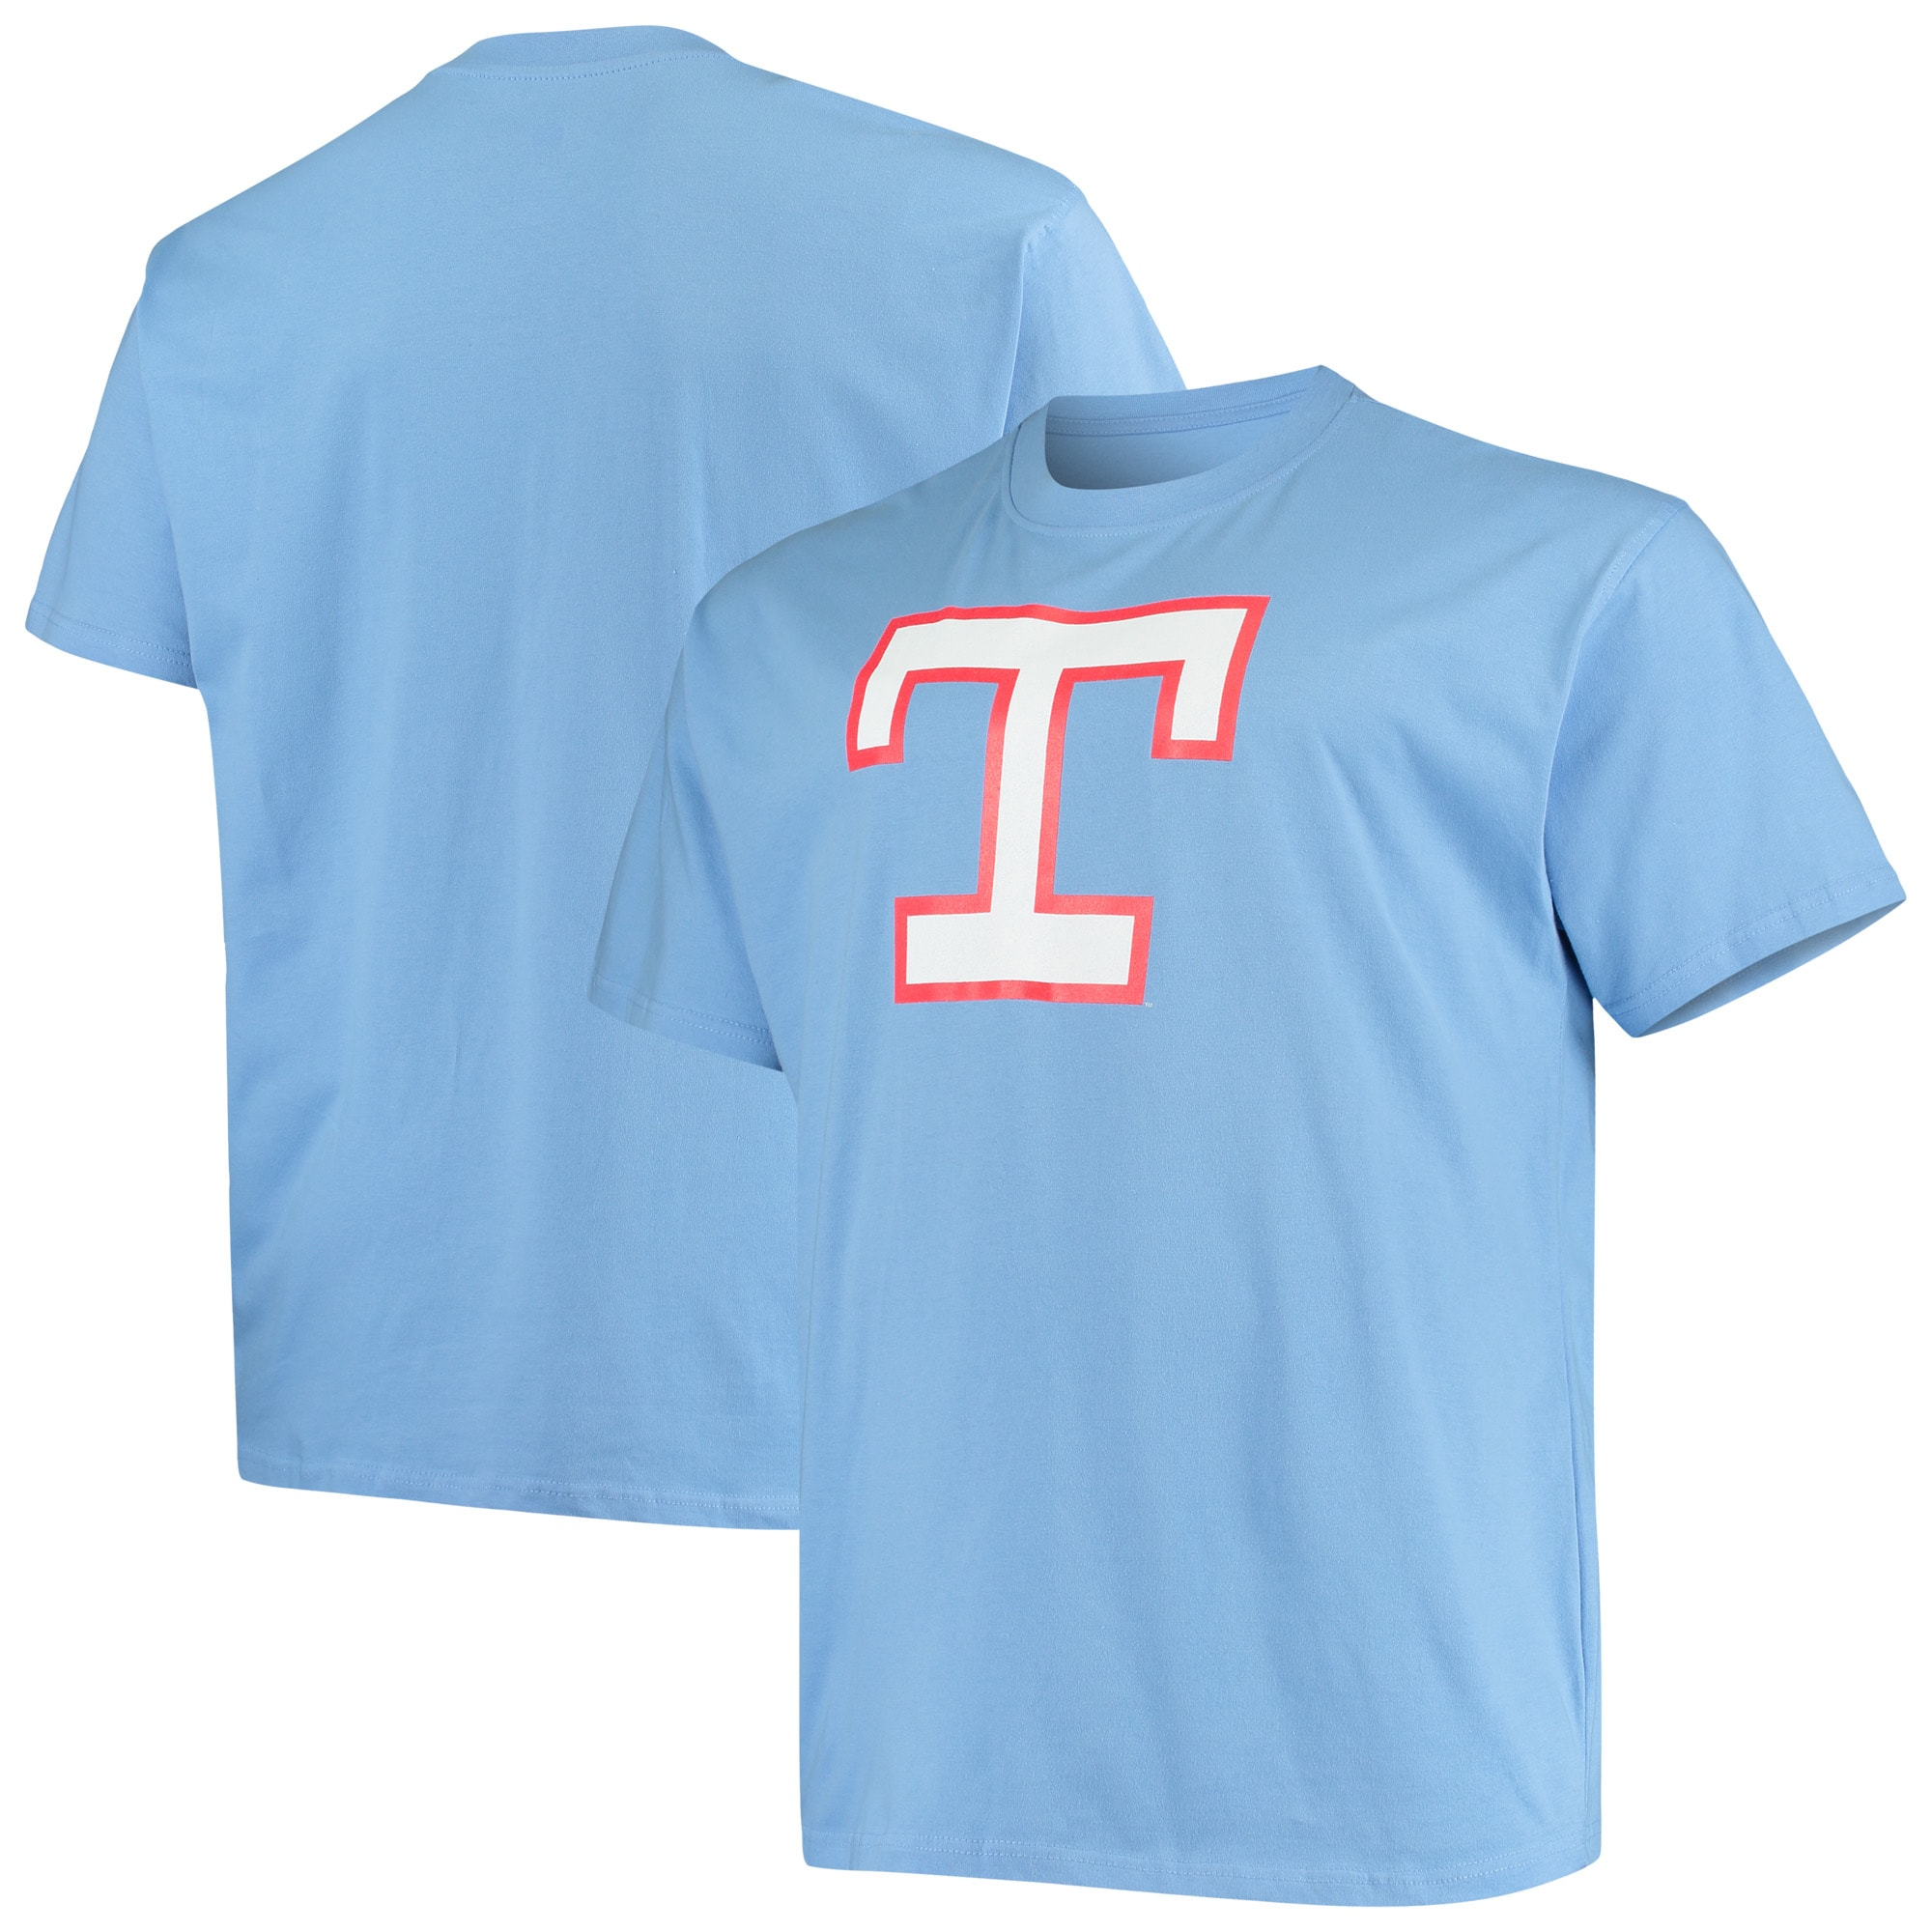 Texas Rangers Big & Tall Cooperstown Collection Large Logo T-Shirt - Light Blue